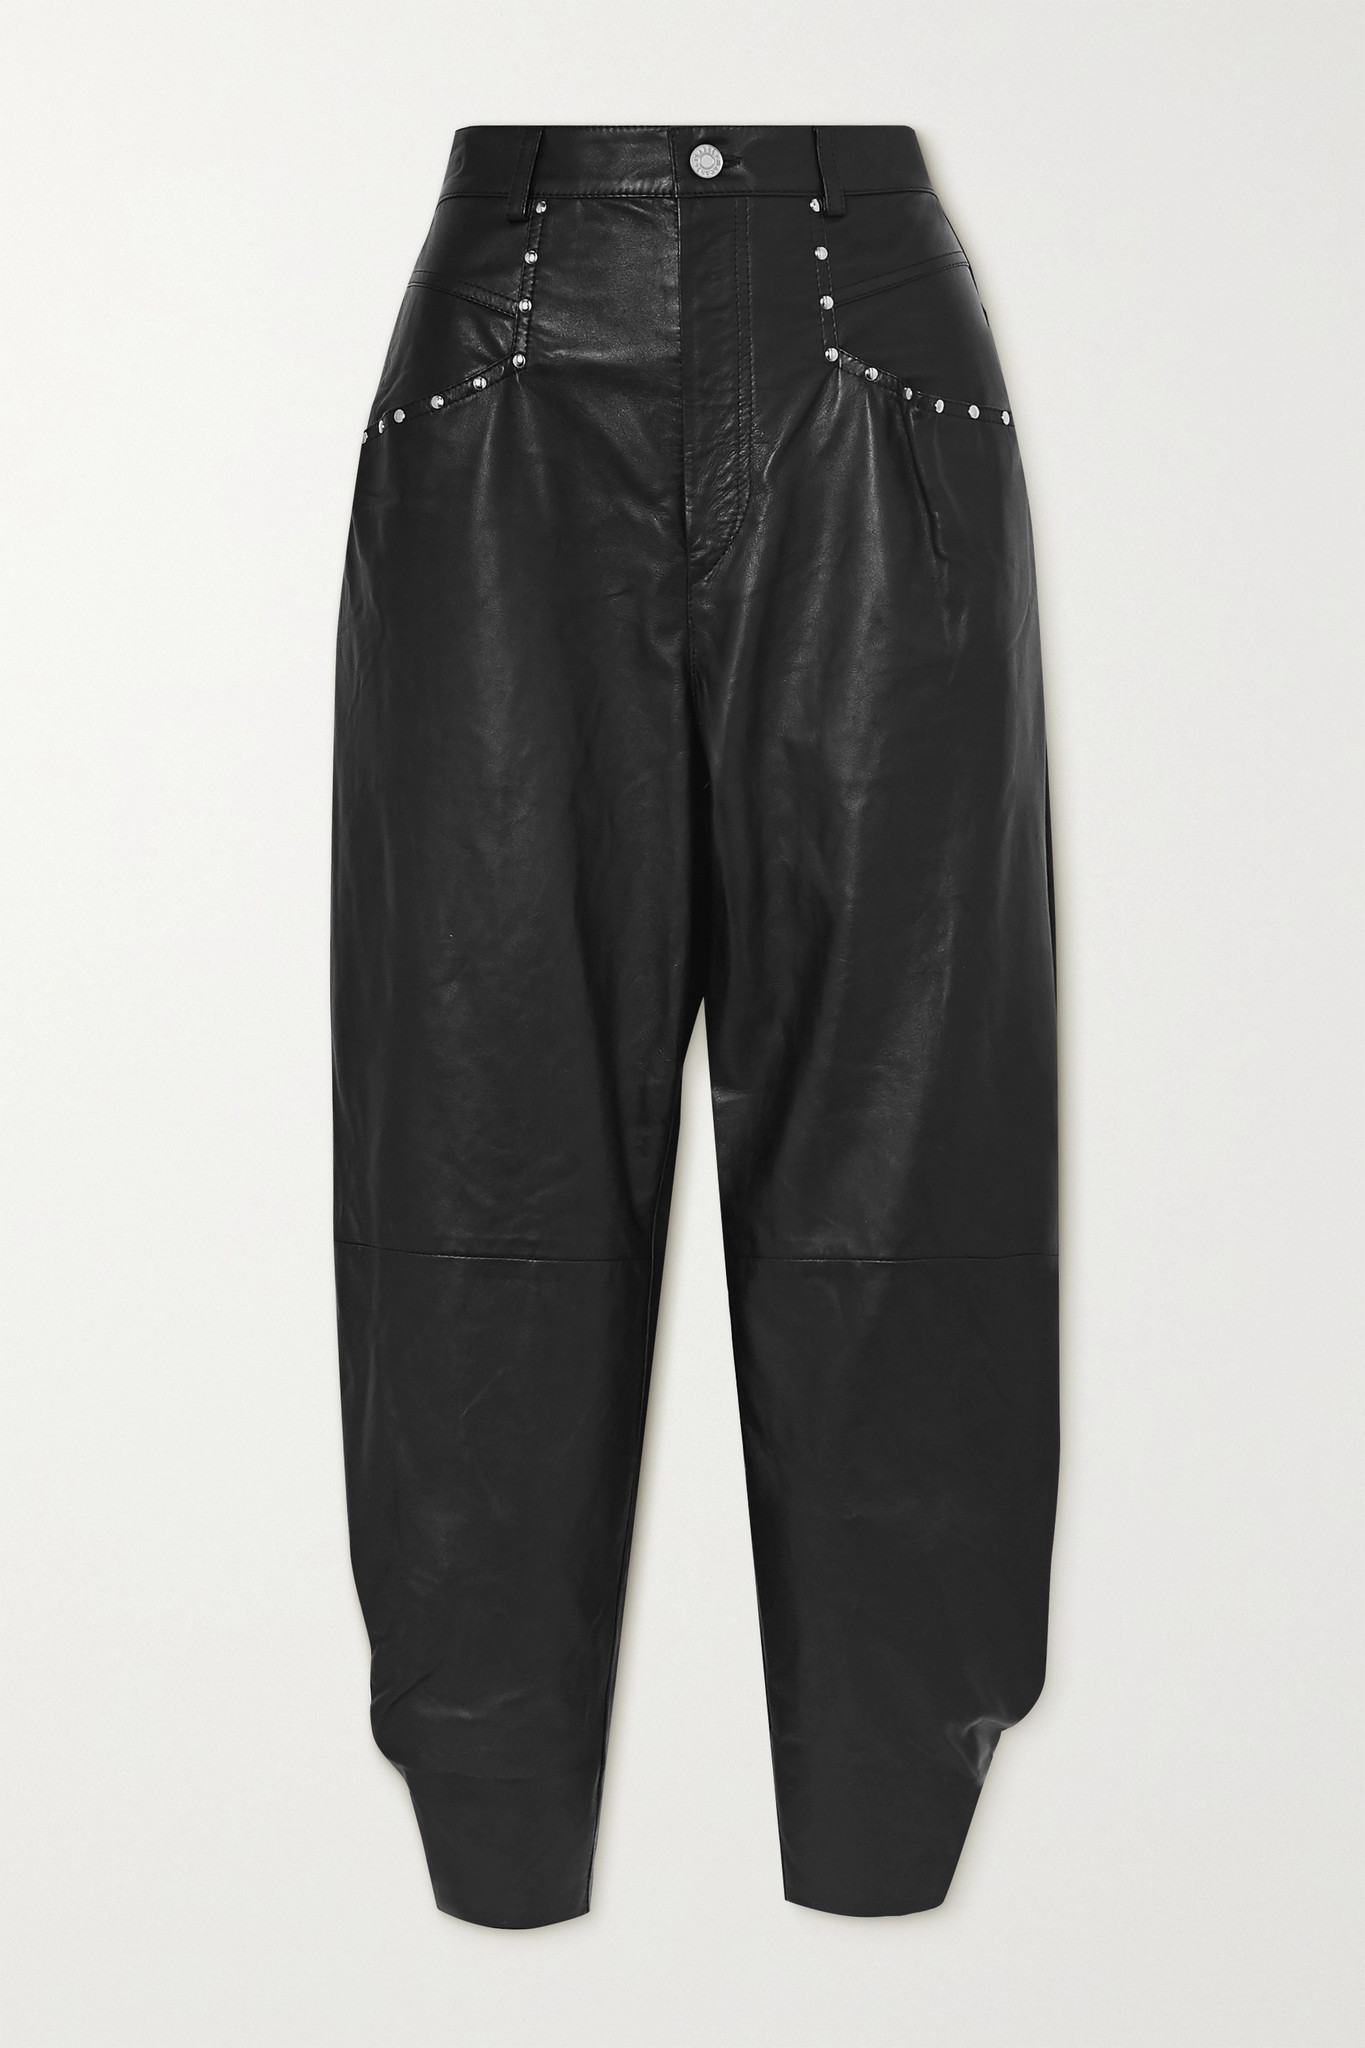 ISABEL MARANT - Studded Leather Tapered Pants - Black - FR36